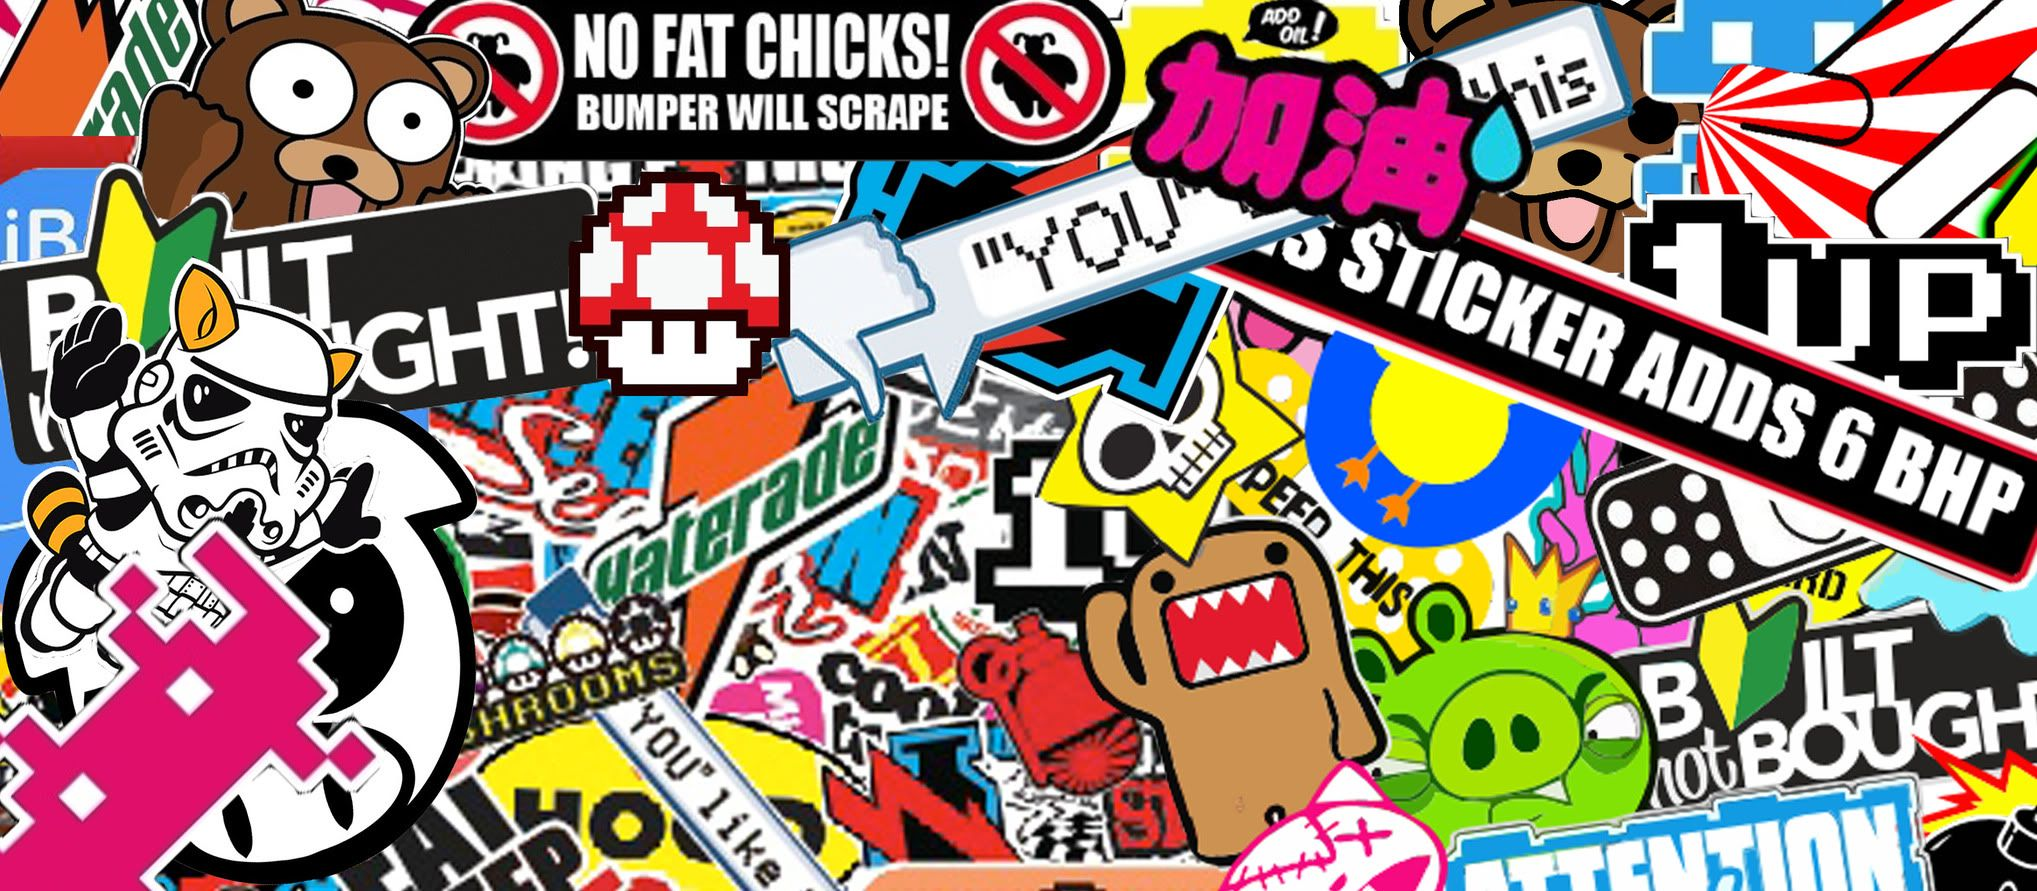 Sticker bomb sticker bomb logo sticker jdm stickers retro futurism creative art